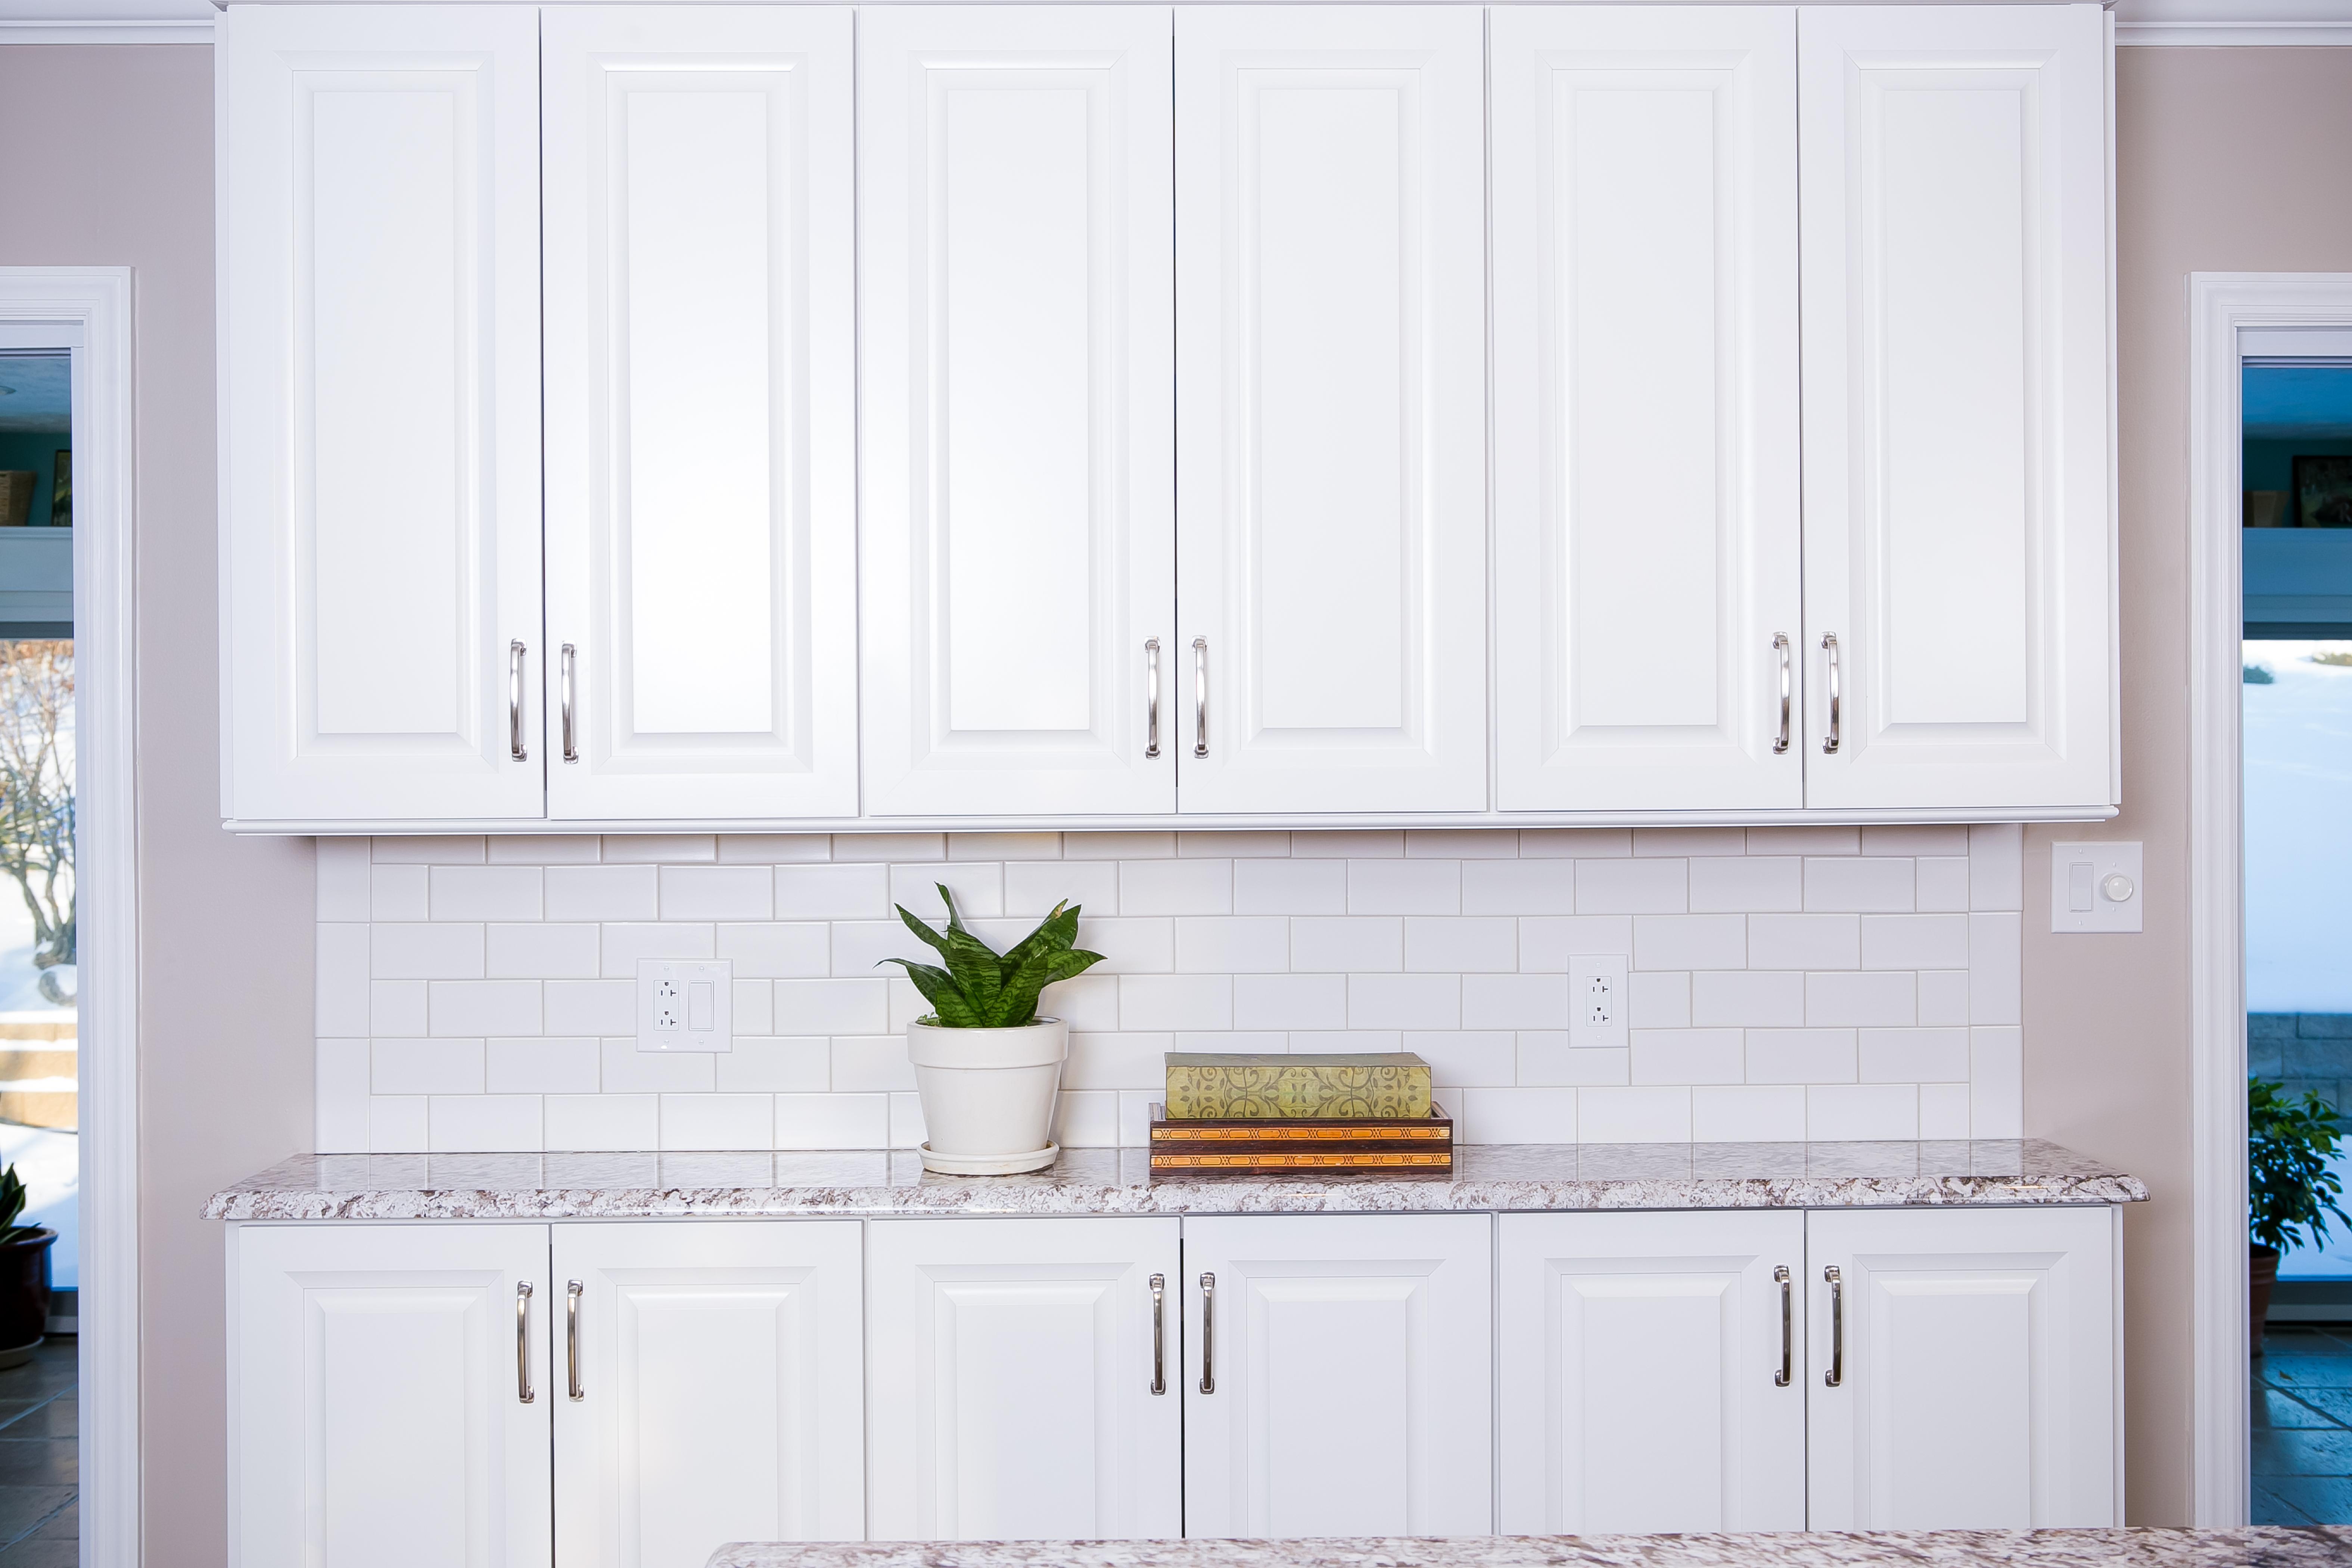 kitchens kitchens   84 design studios  rh   84designstudios com